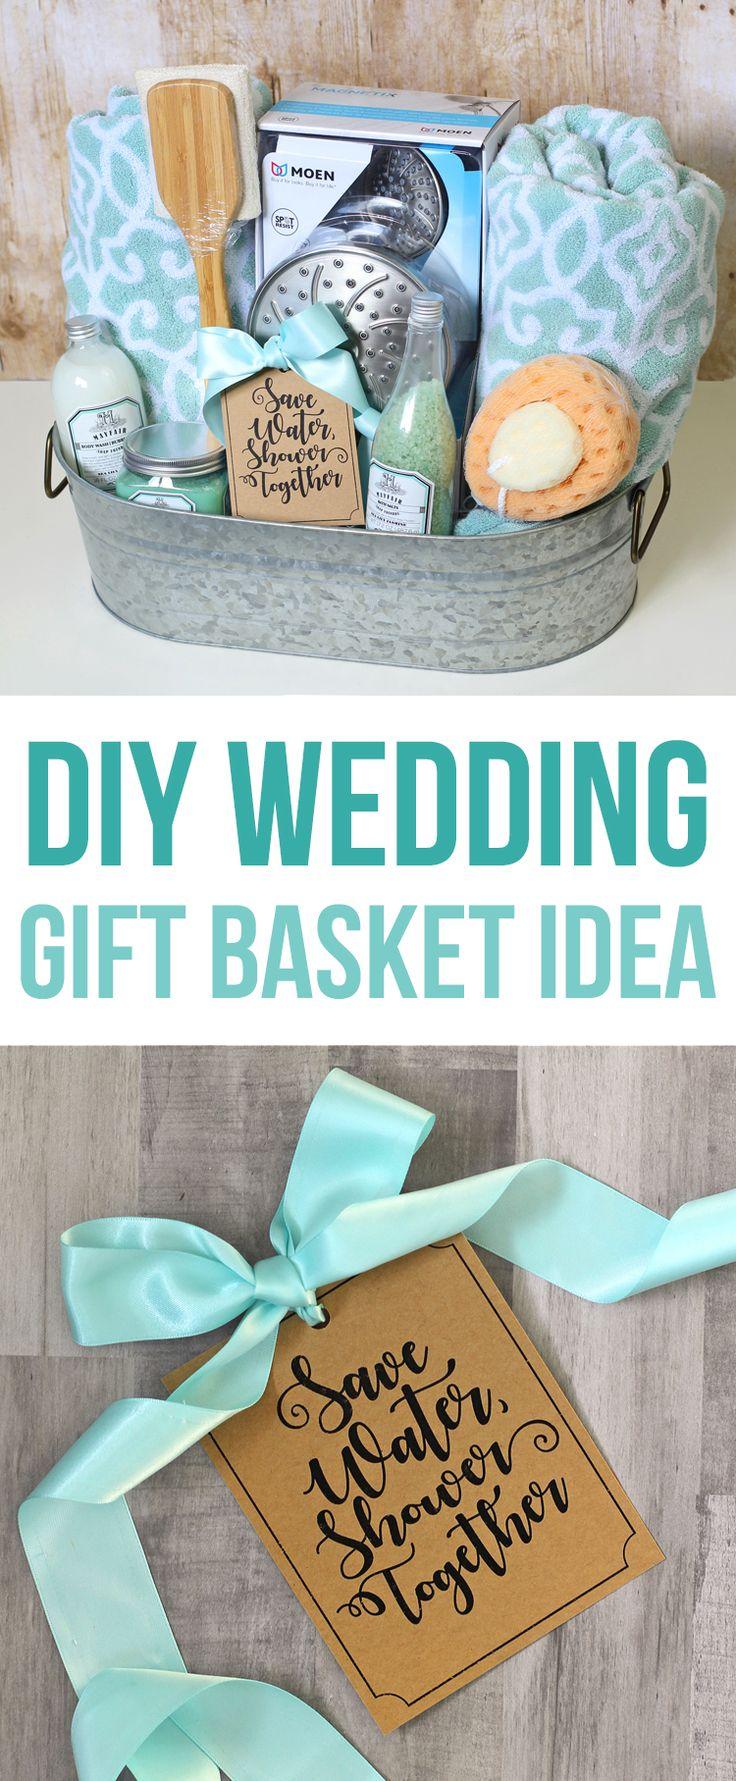 Diy Wedding Gift Registry : wedding gift baskets diy wedding gifts wedding shower gift basket ...